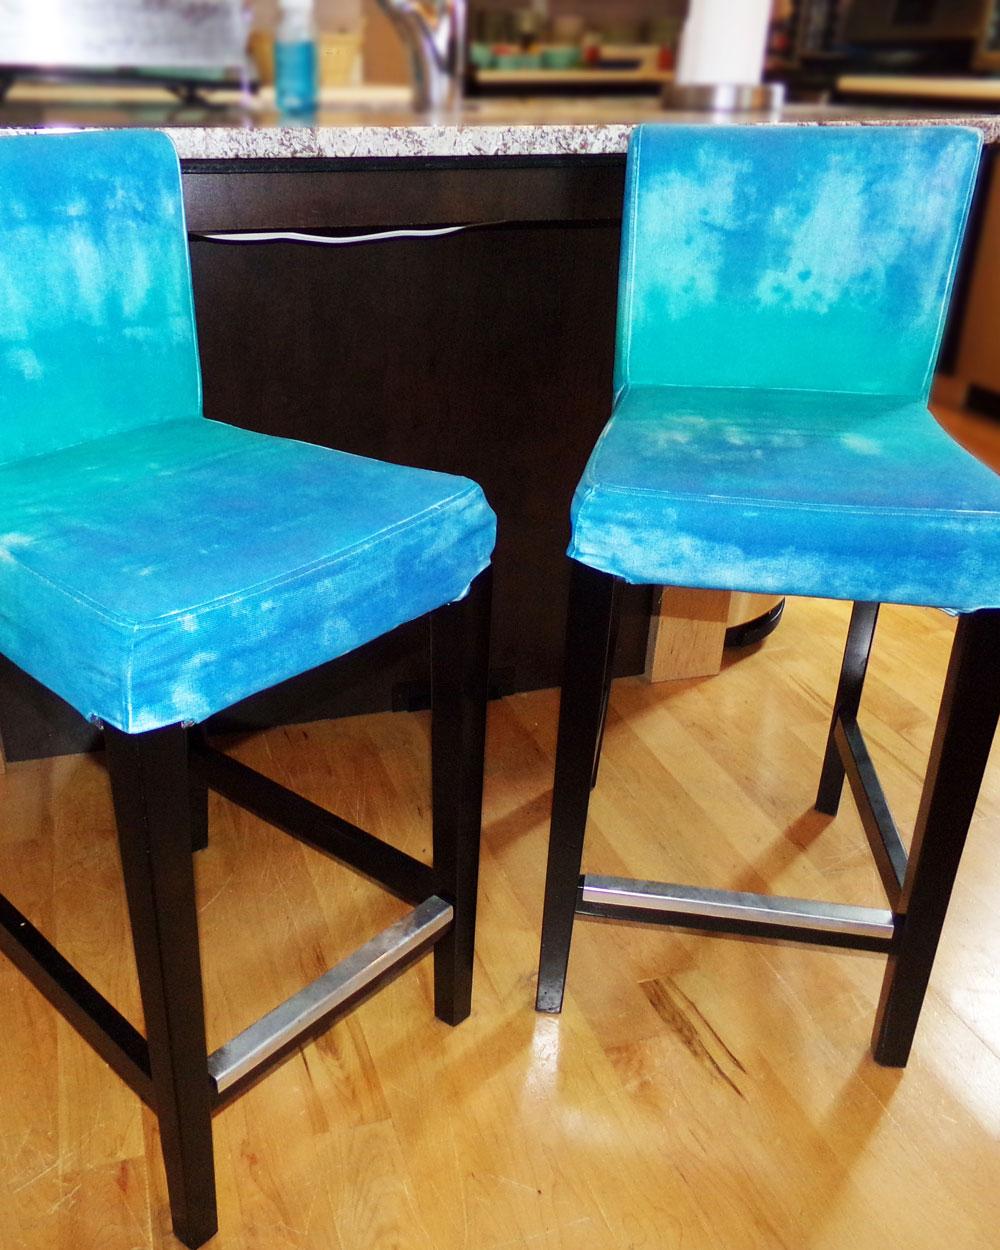 Final reveal of bar stool